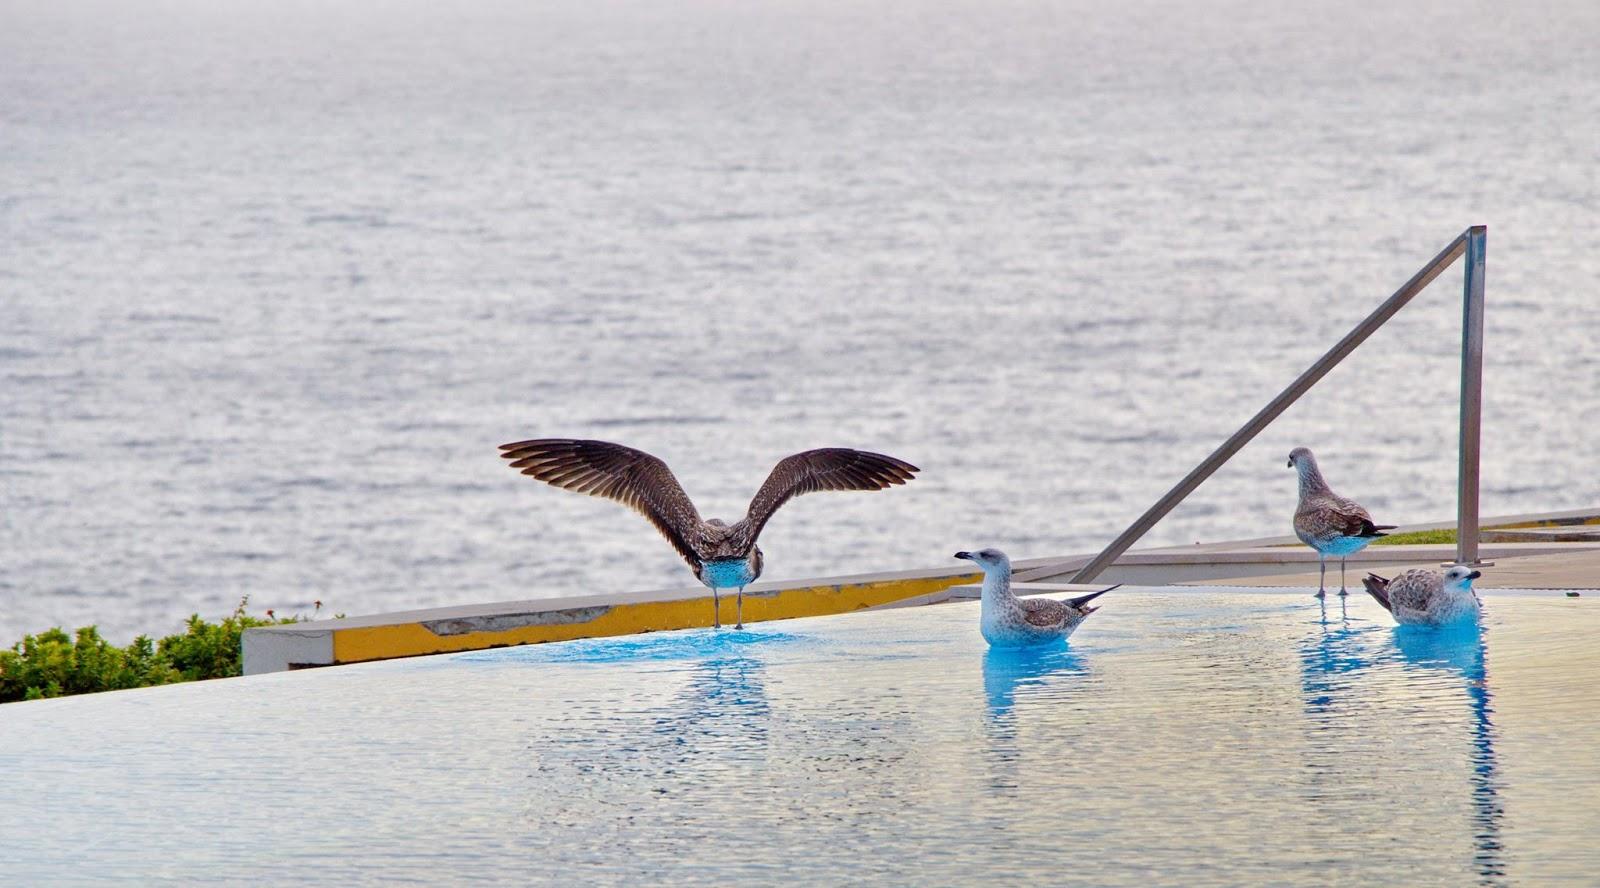 gaivotas na piscina